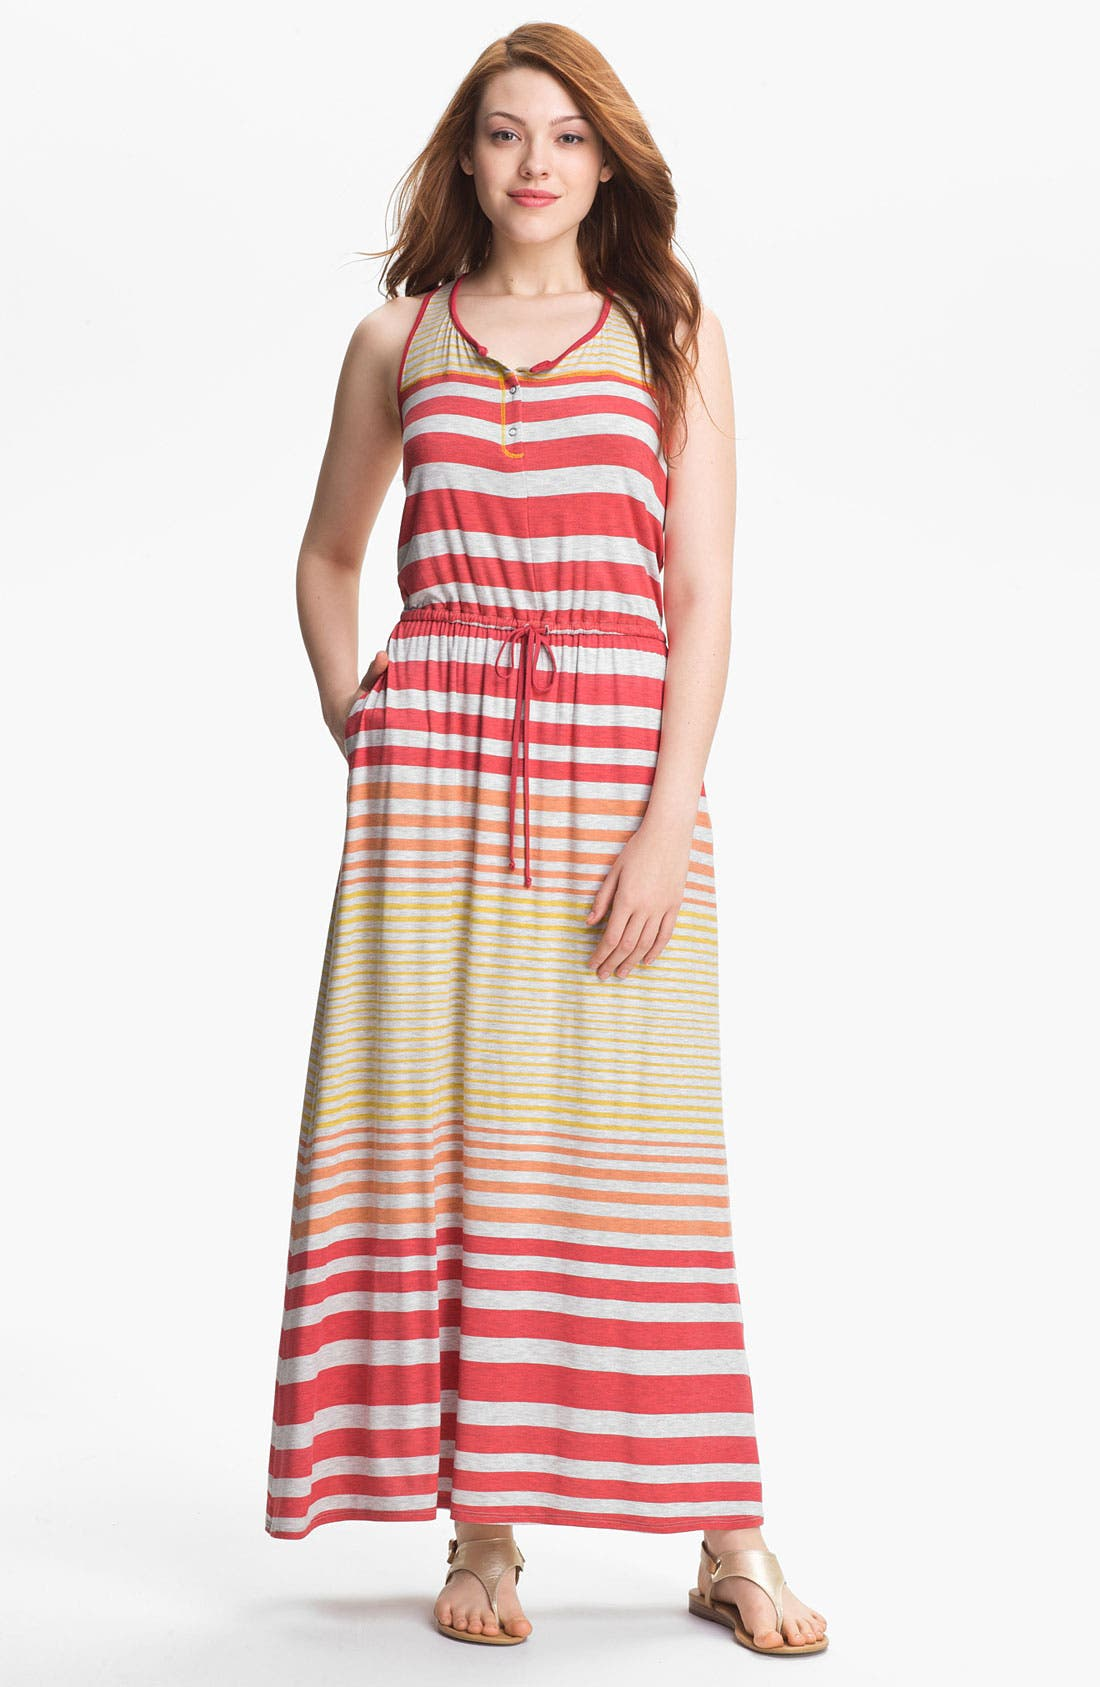 Alternate Image 1 Selected - Max & Mia Drawstring Waist Maxi Dress